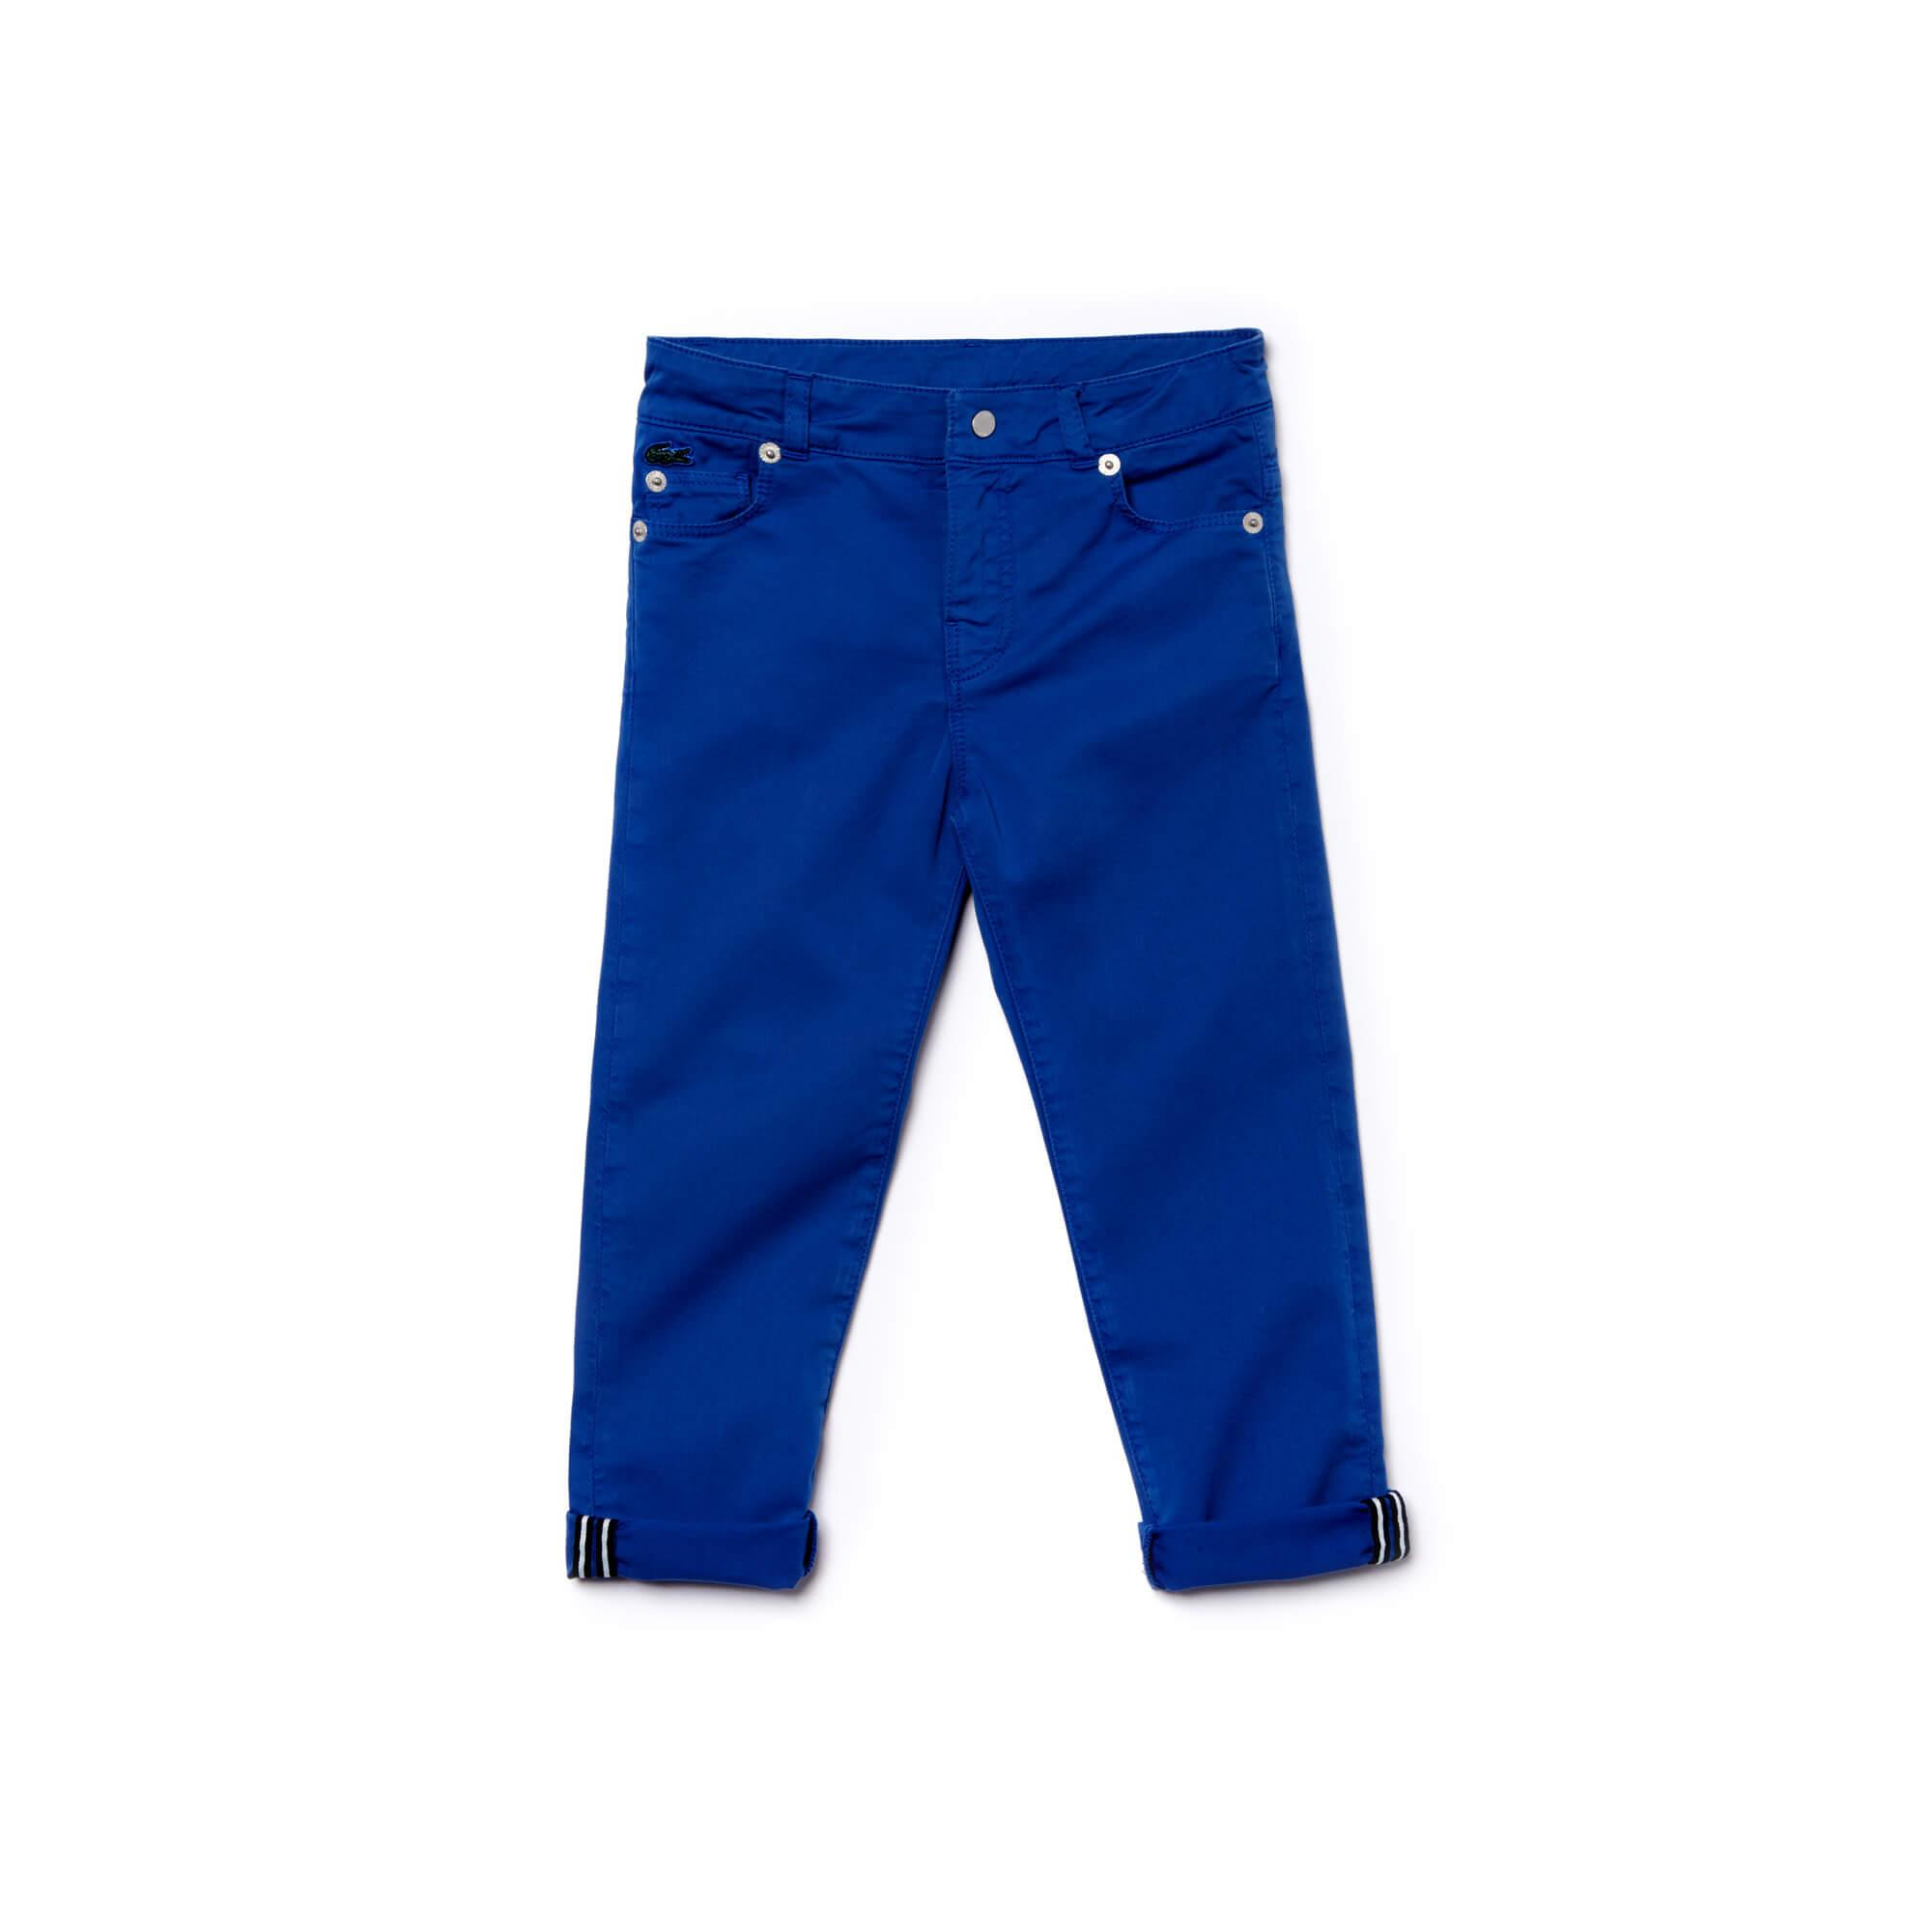 Lacoste Boys' Trousers